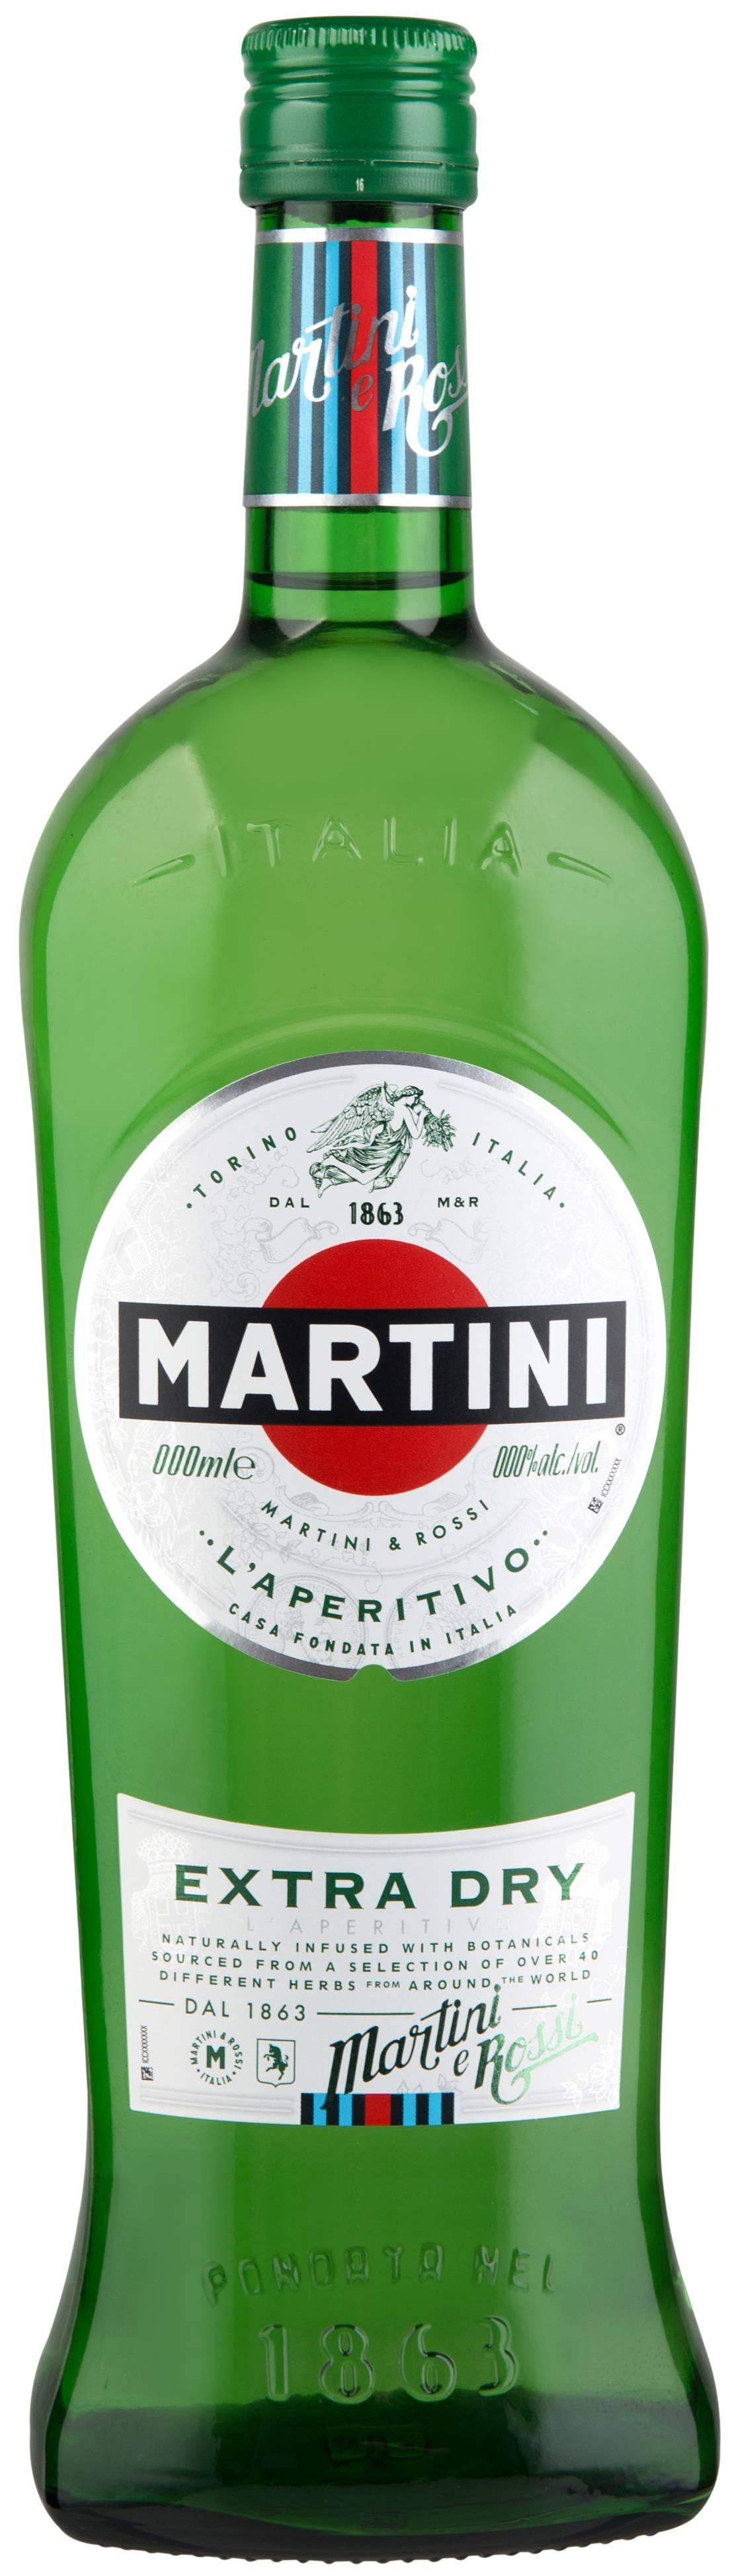 Обзор мартини экстра драй